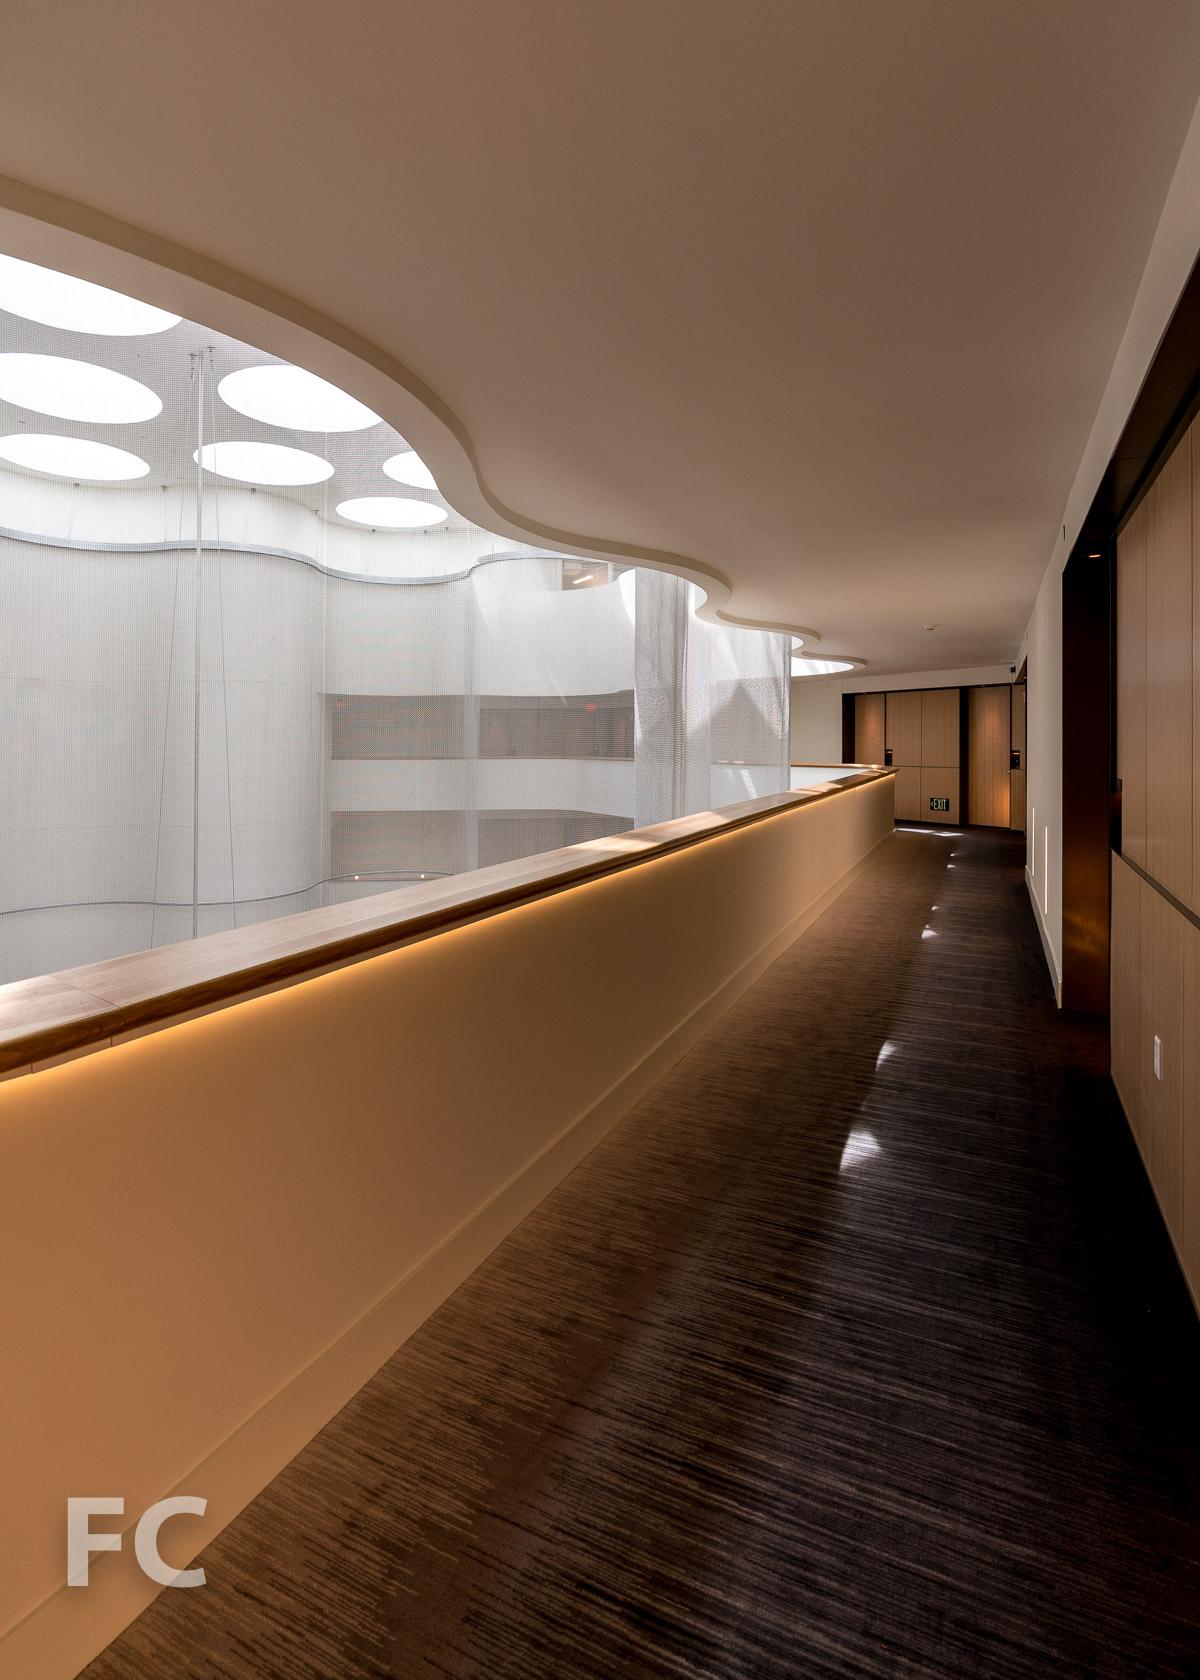 Hotel corridor at the 10th floor.